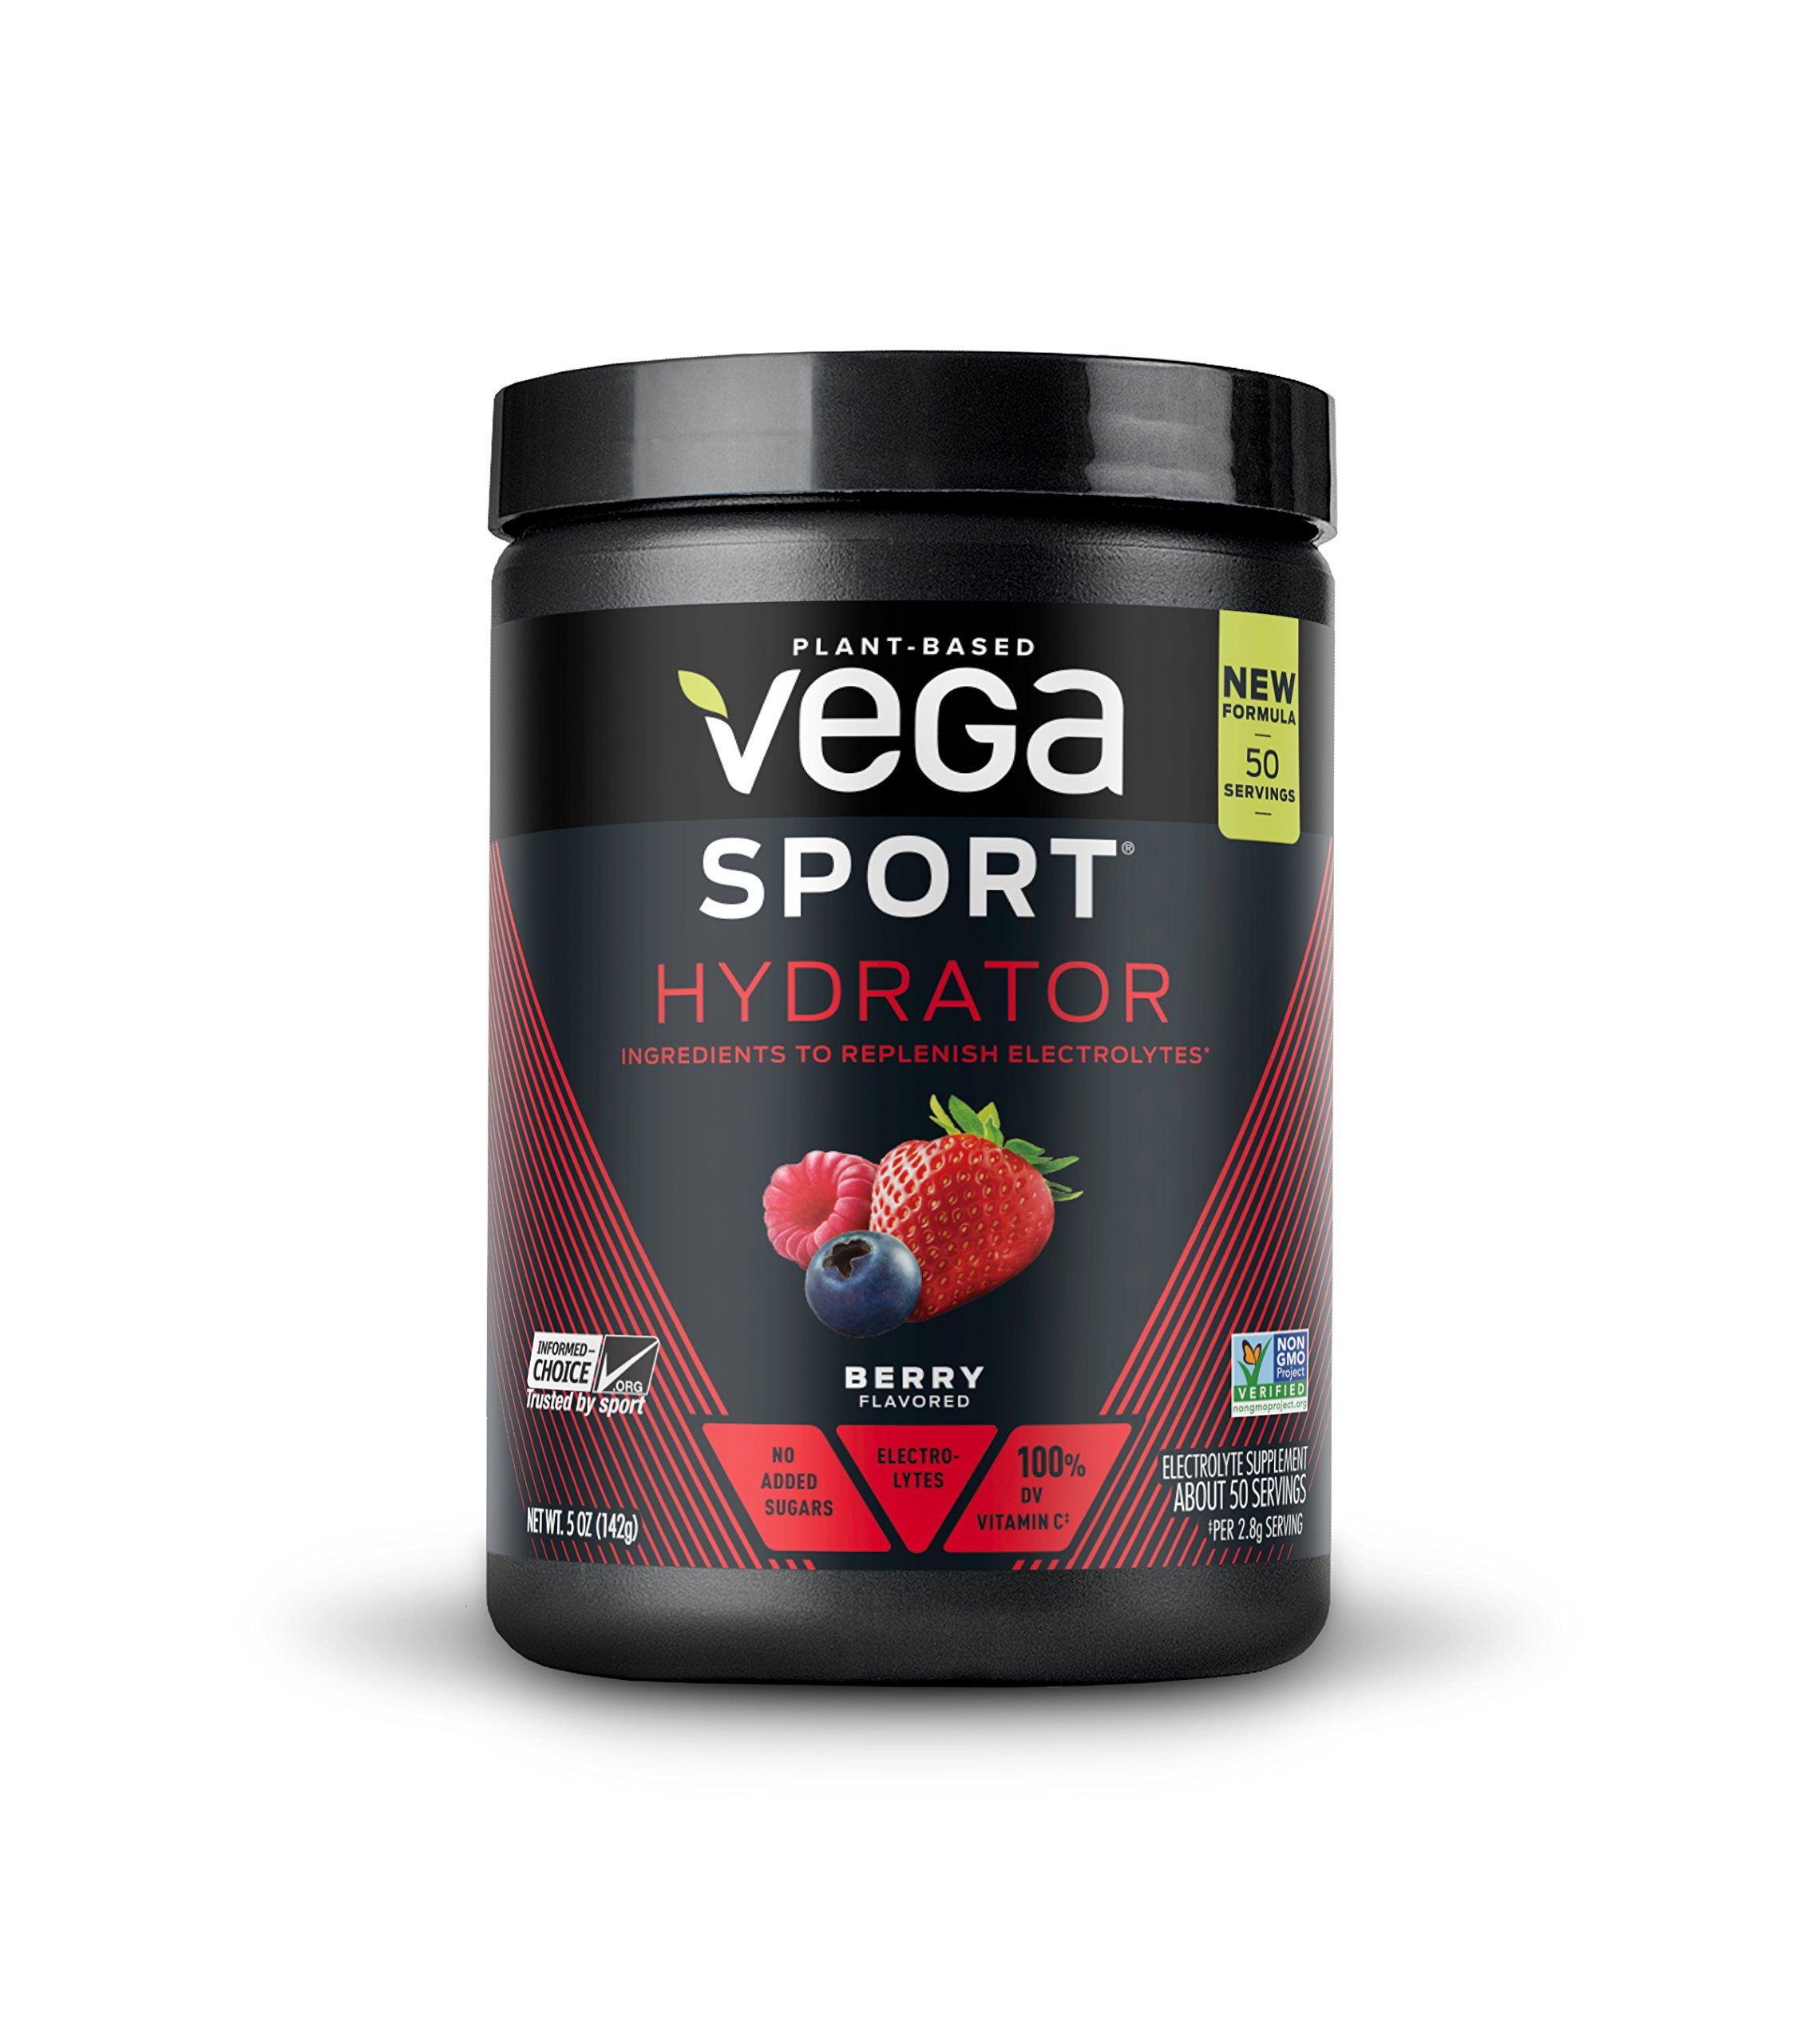 New Vega Sport Hydrator Berry (50 Servings, 5.0 oz Tub) - Electrolyte Powder